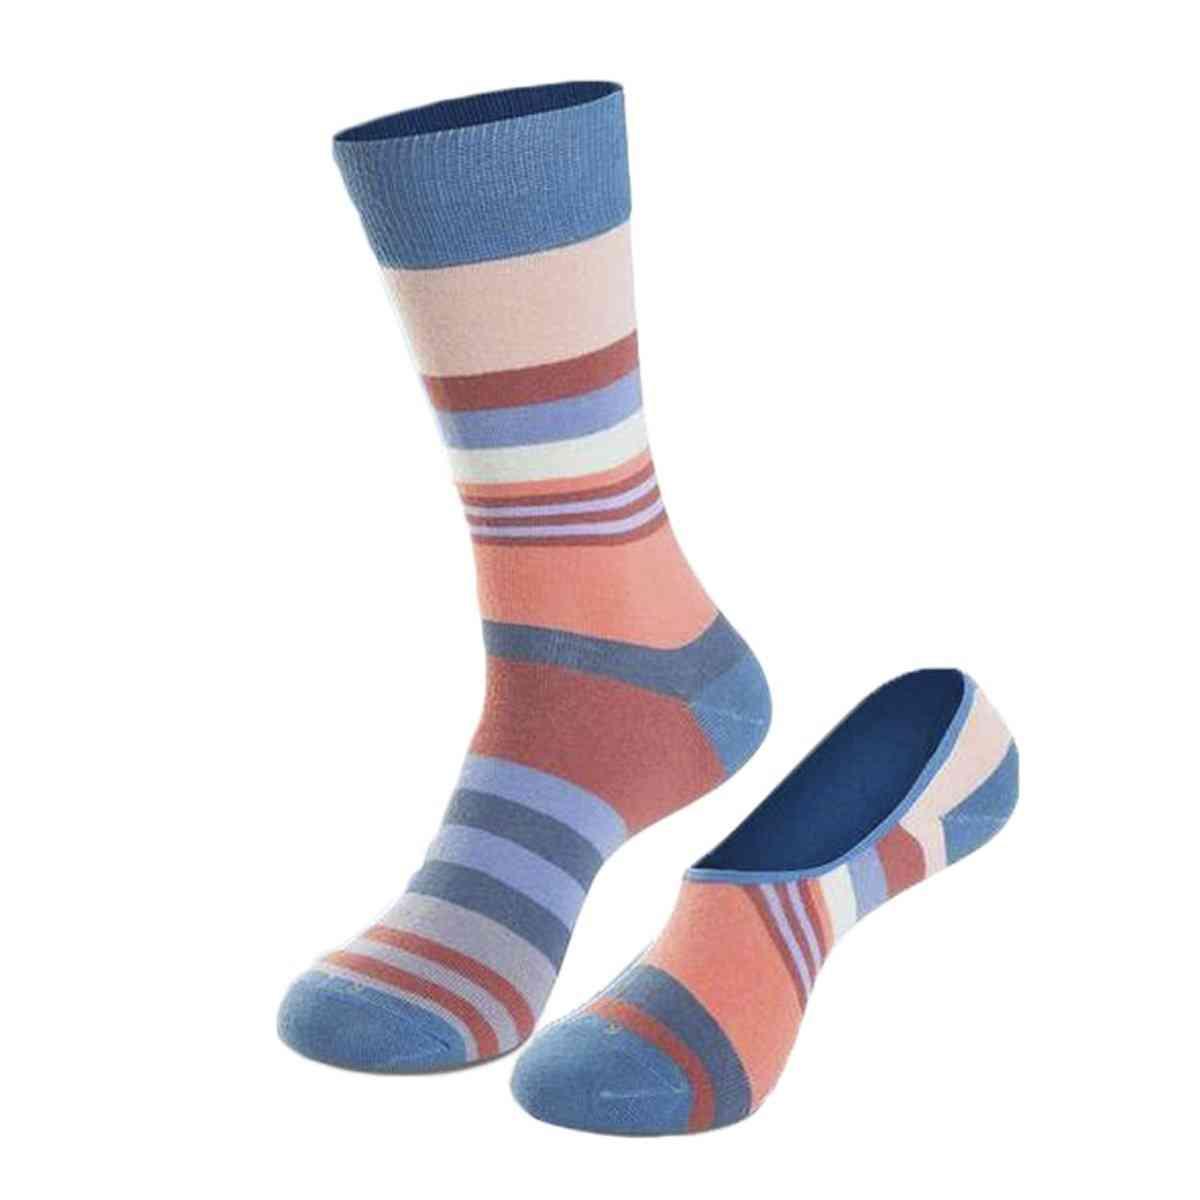 Stay Put Crew Socks